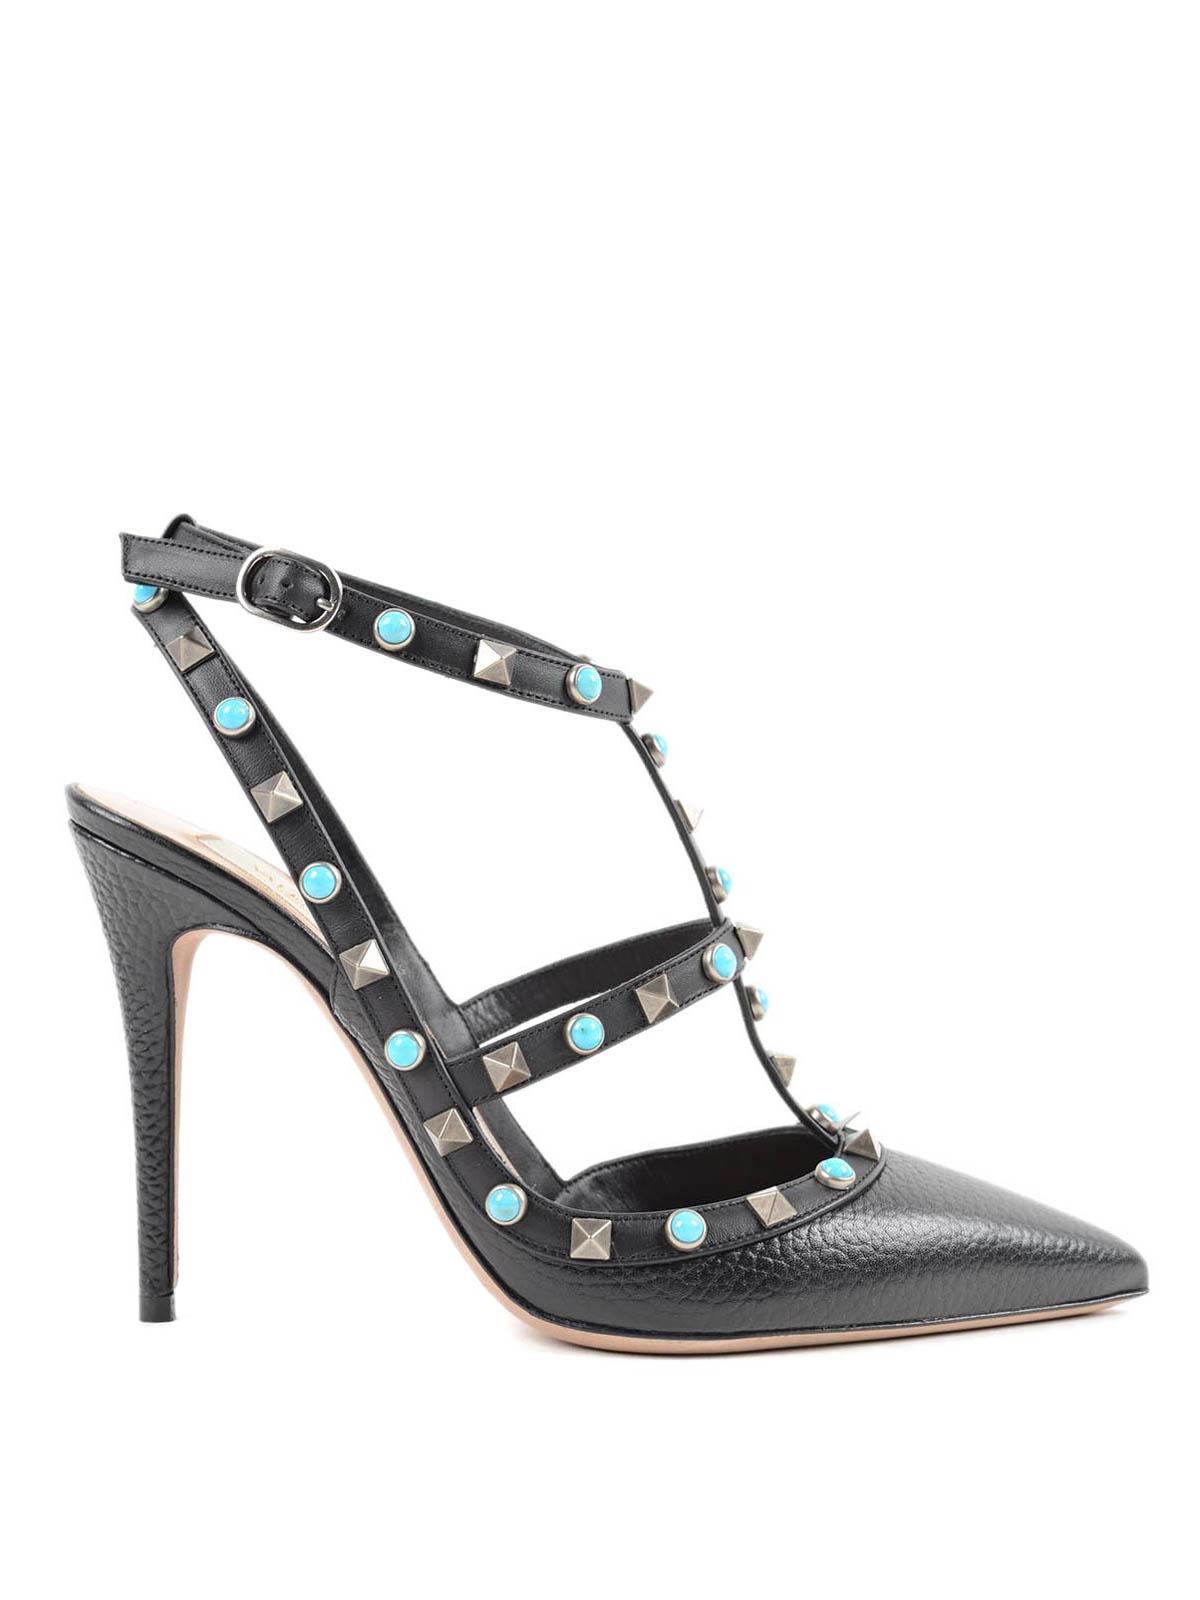 round rockstud court shoes by valentino garavani court shoes ikrix. Black Bedroom Furniture Sets. Home Design Ideas